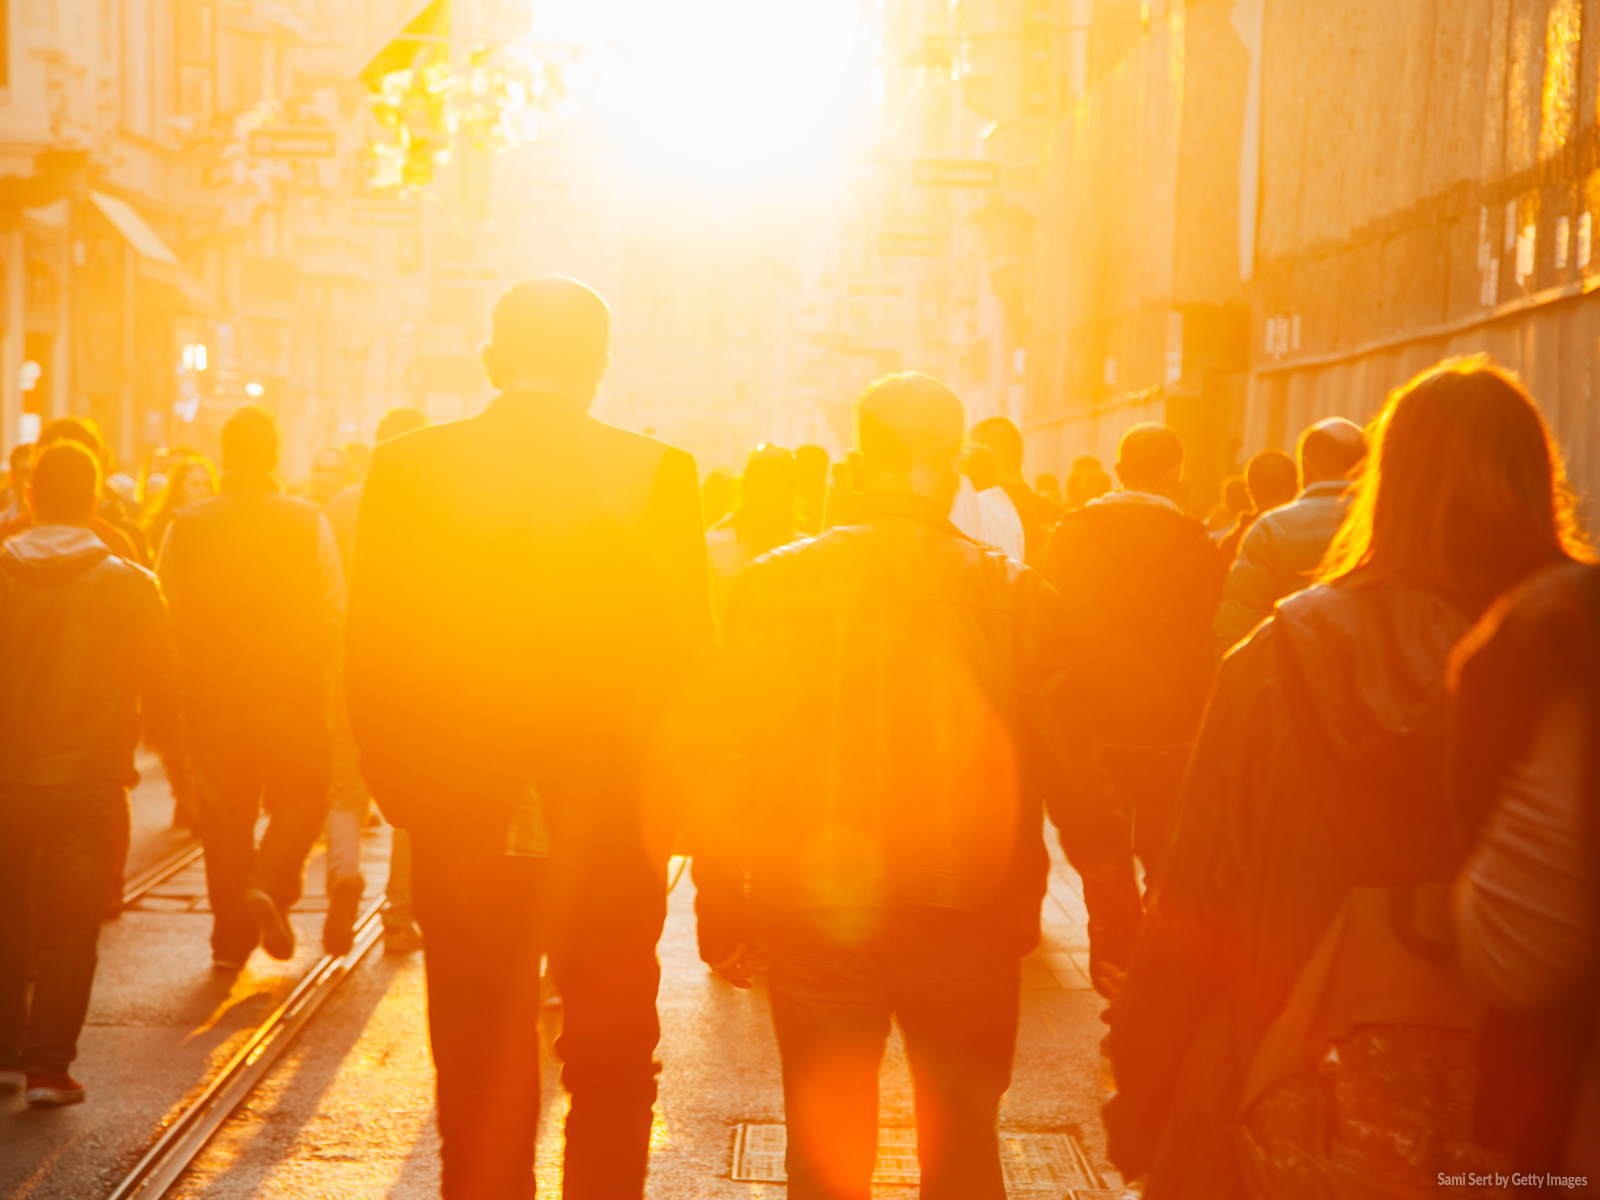 Como-podemos-trilhar-a-vida-espiritual-nas-segundas-moradas